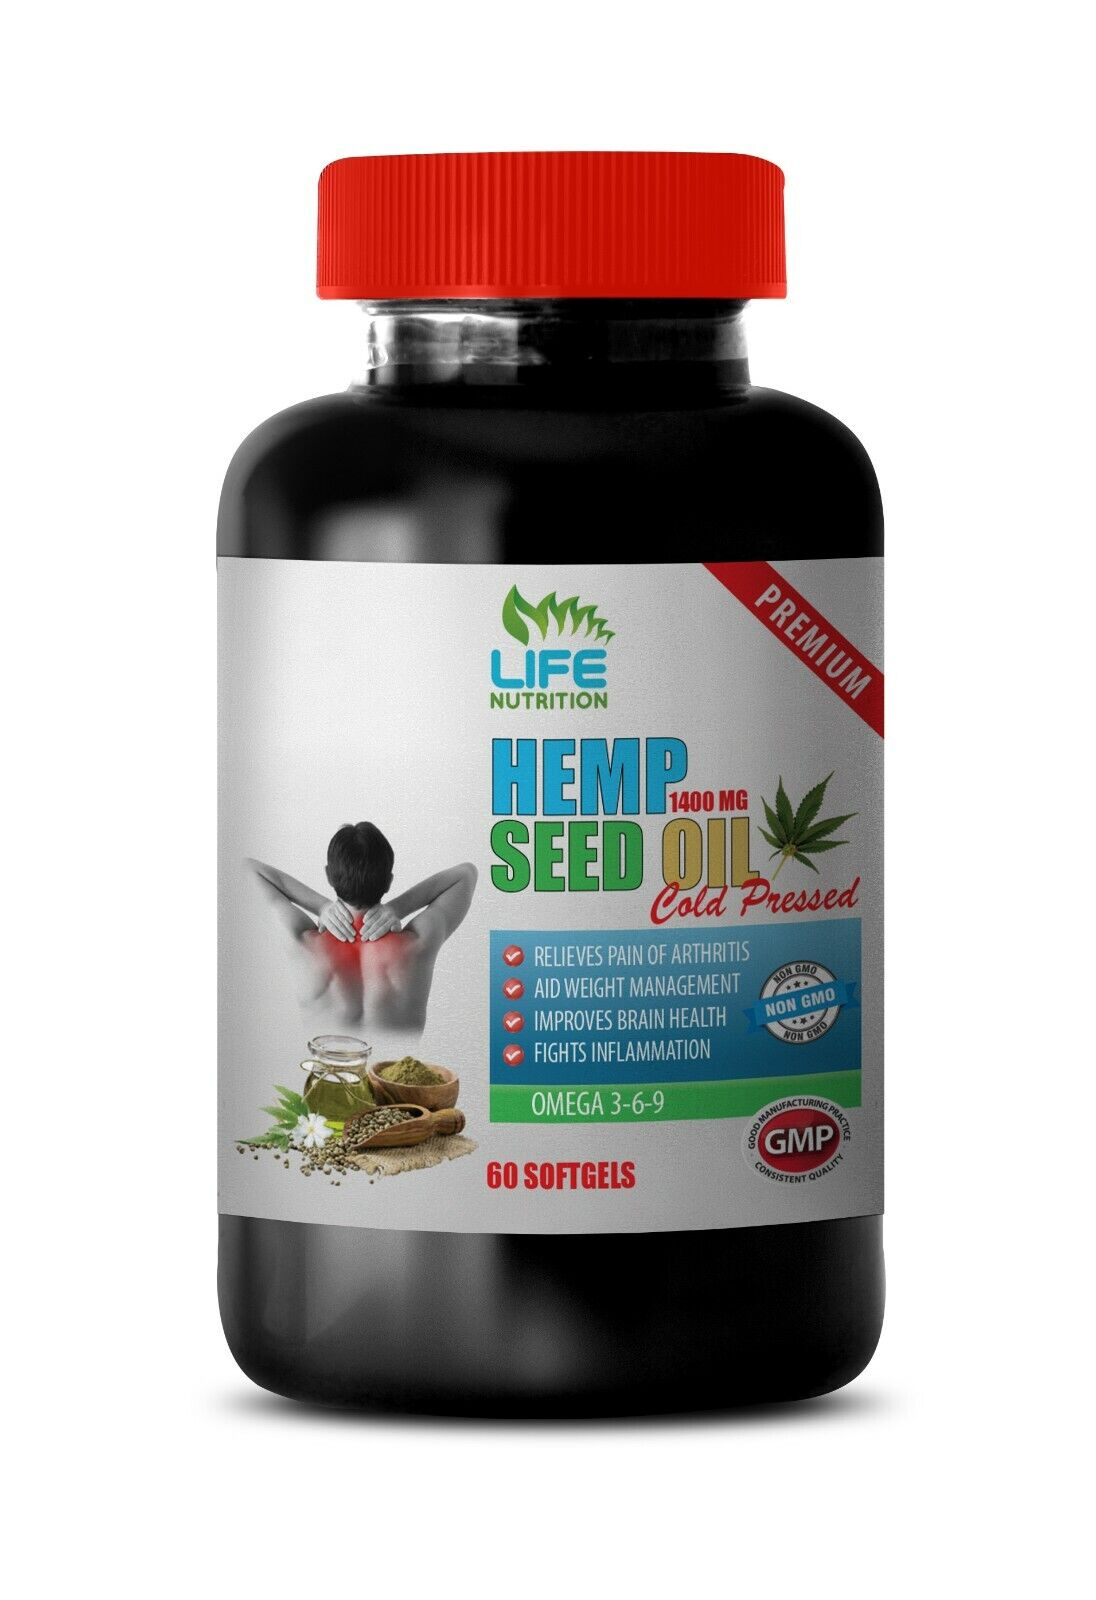 relieve joint pain, ORGANIC HEMP SEED OIL 1400mg, anti inflammatory properties 1